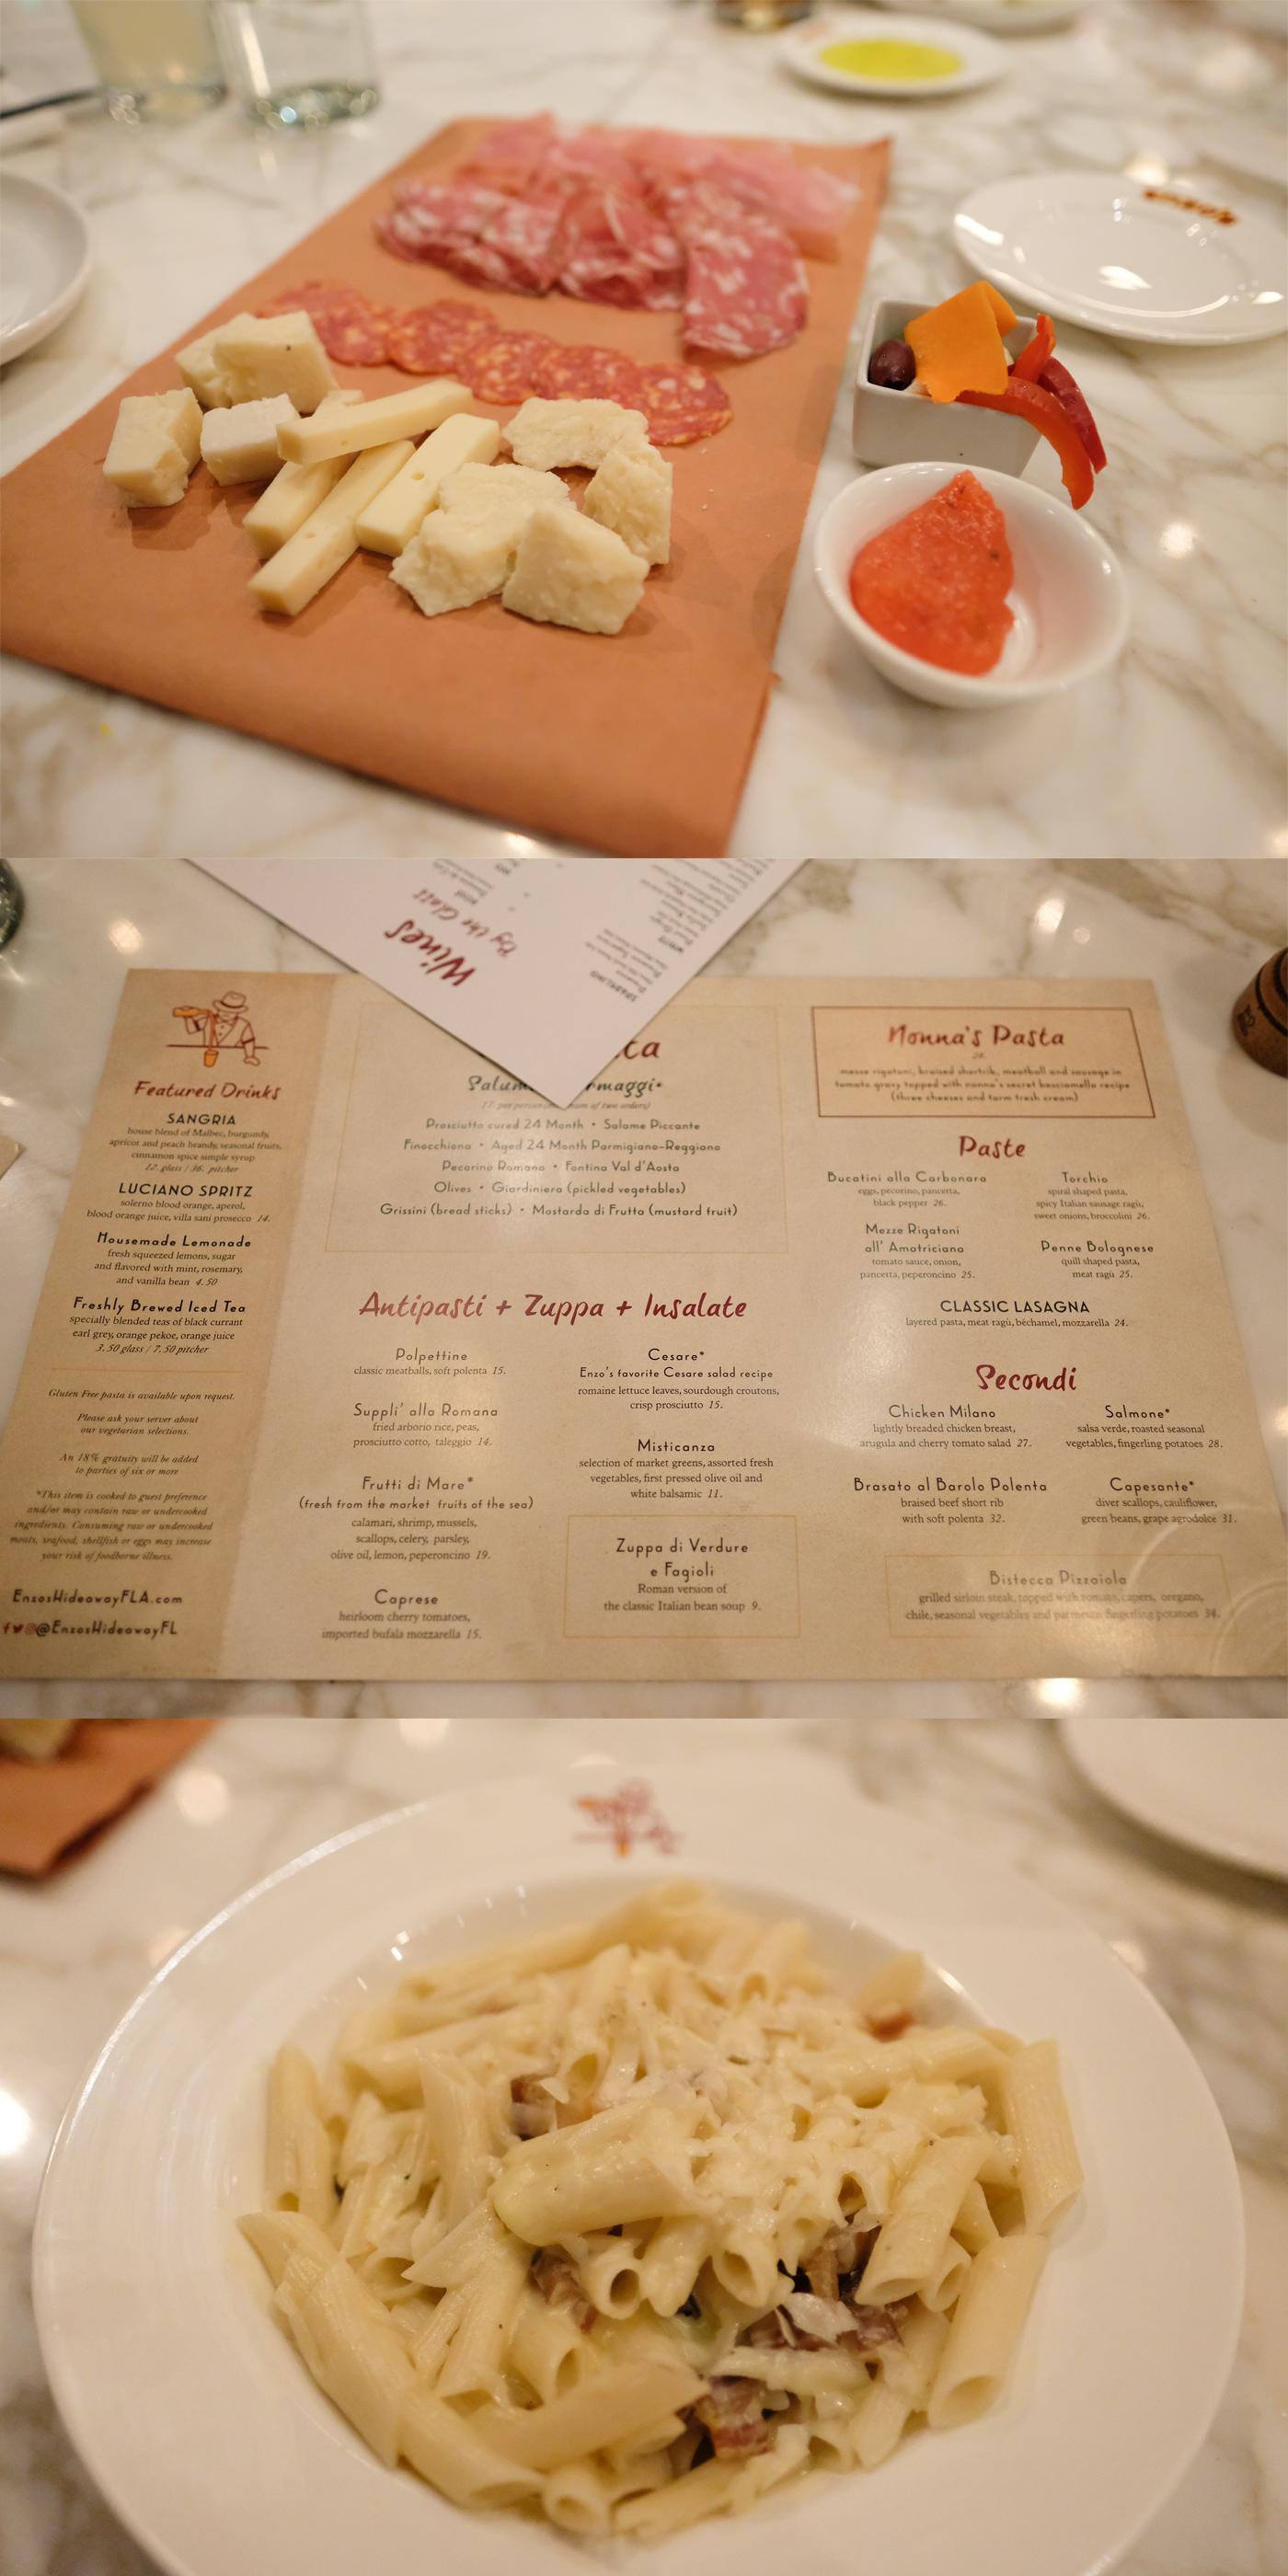 Gluten Free at Walt Disney World - Enzo's Hideaway Tunnel Bar & Restaurant